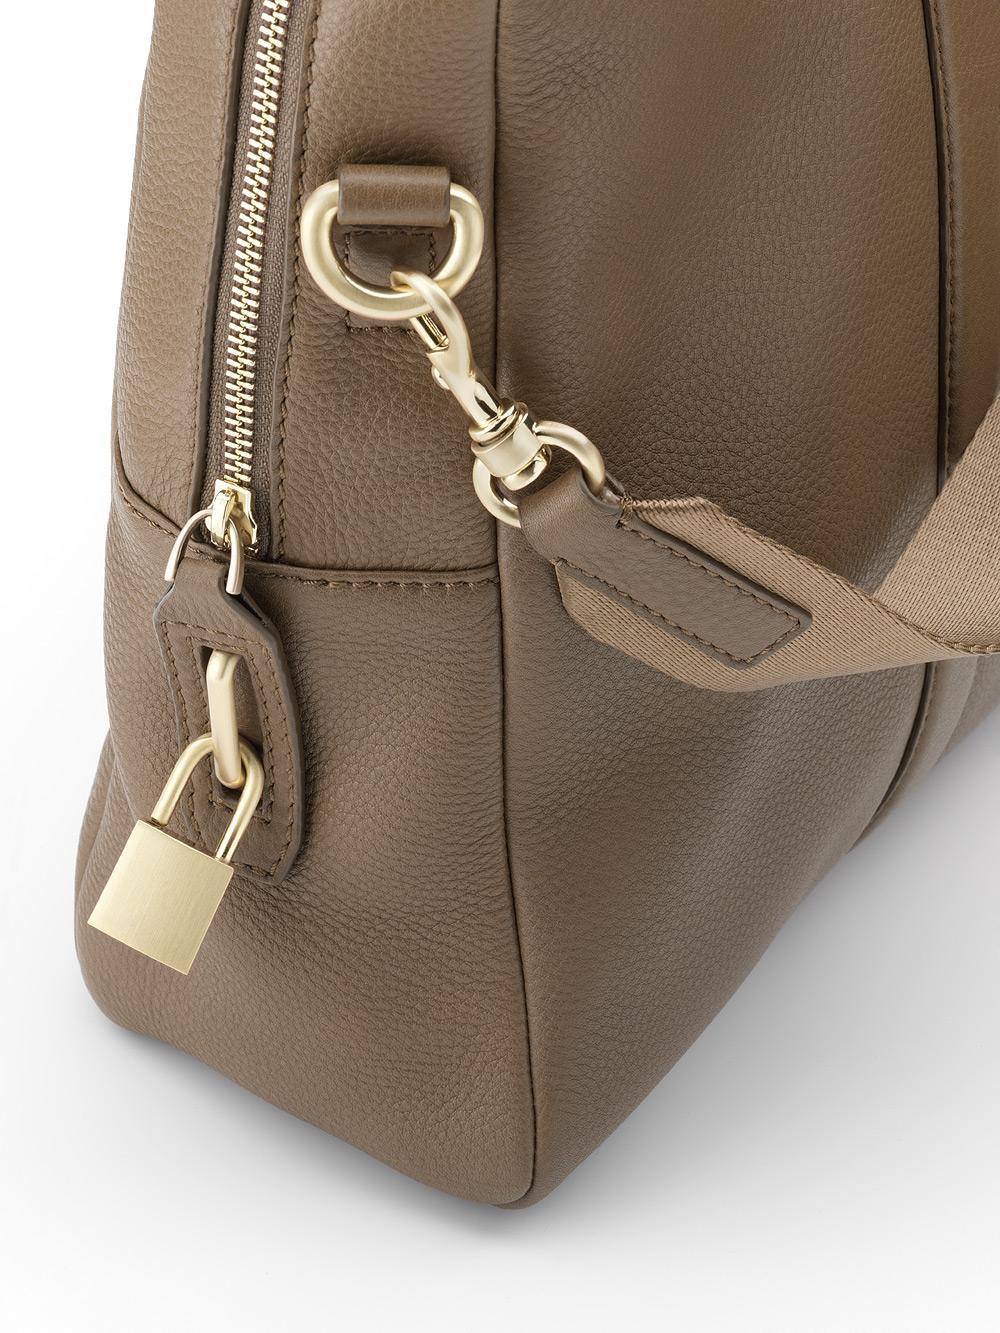 Elegant Women Tote Handbag Shoulder Crossbody Bag PU Leather Business Casual